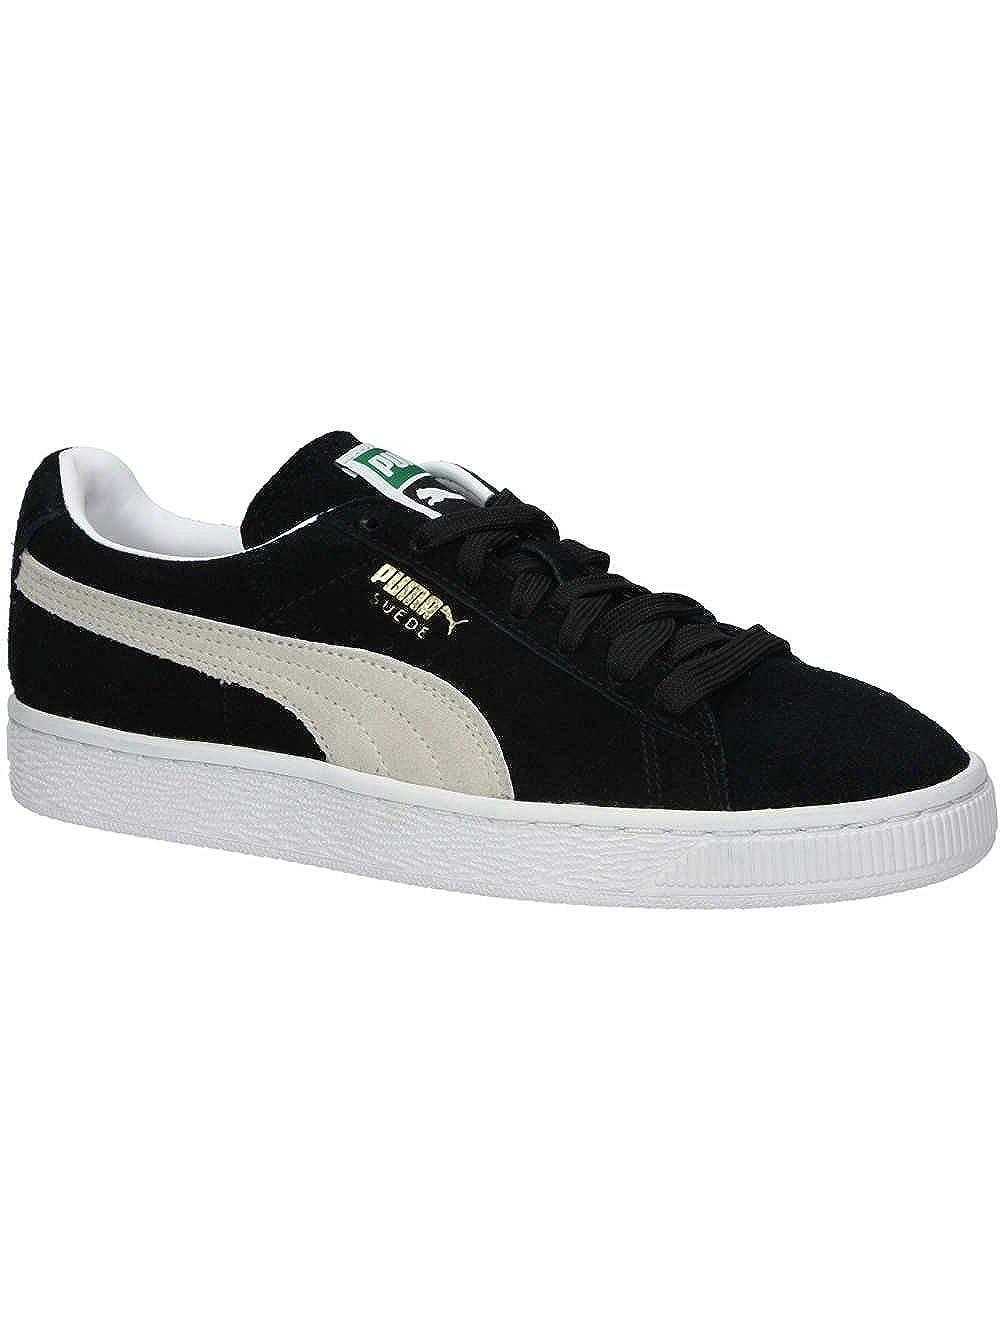 Puma Sneakers Donna camoscio Classic + Sneakers Donna